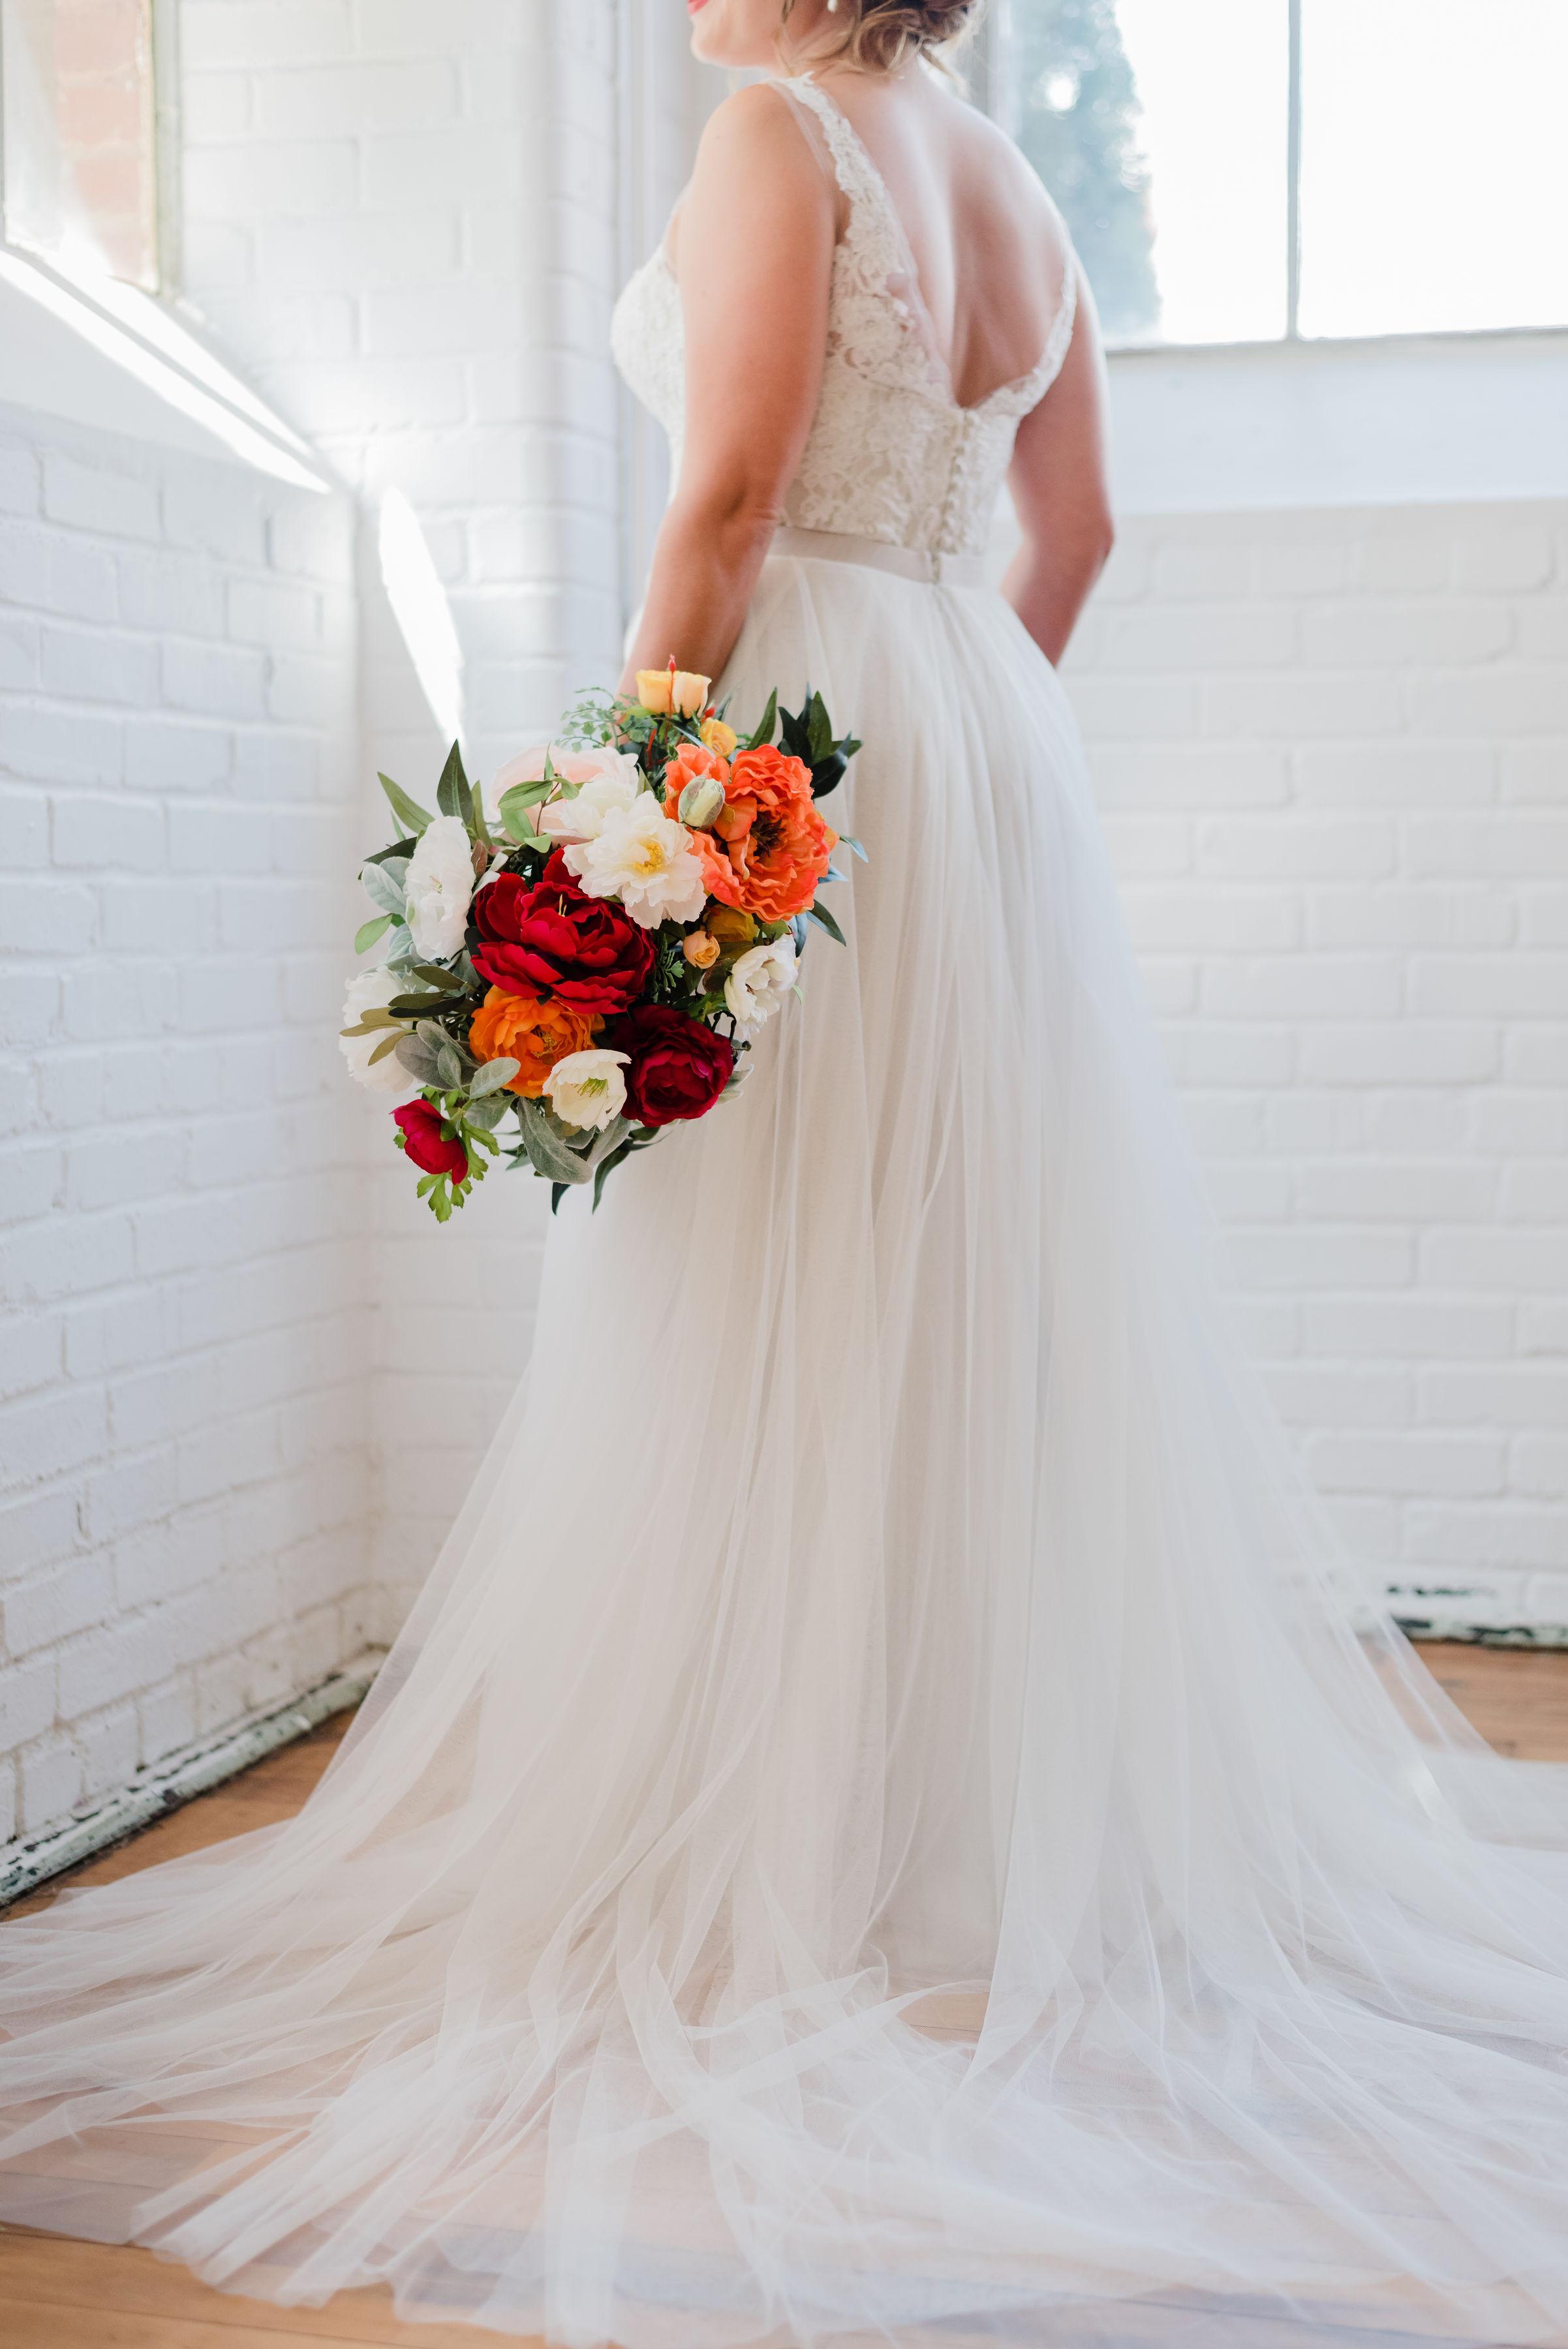 TaylorAdams_bridals-45.jpg